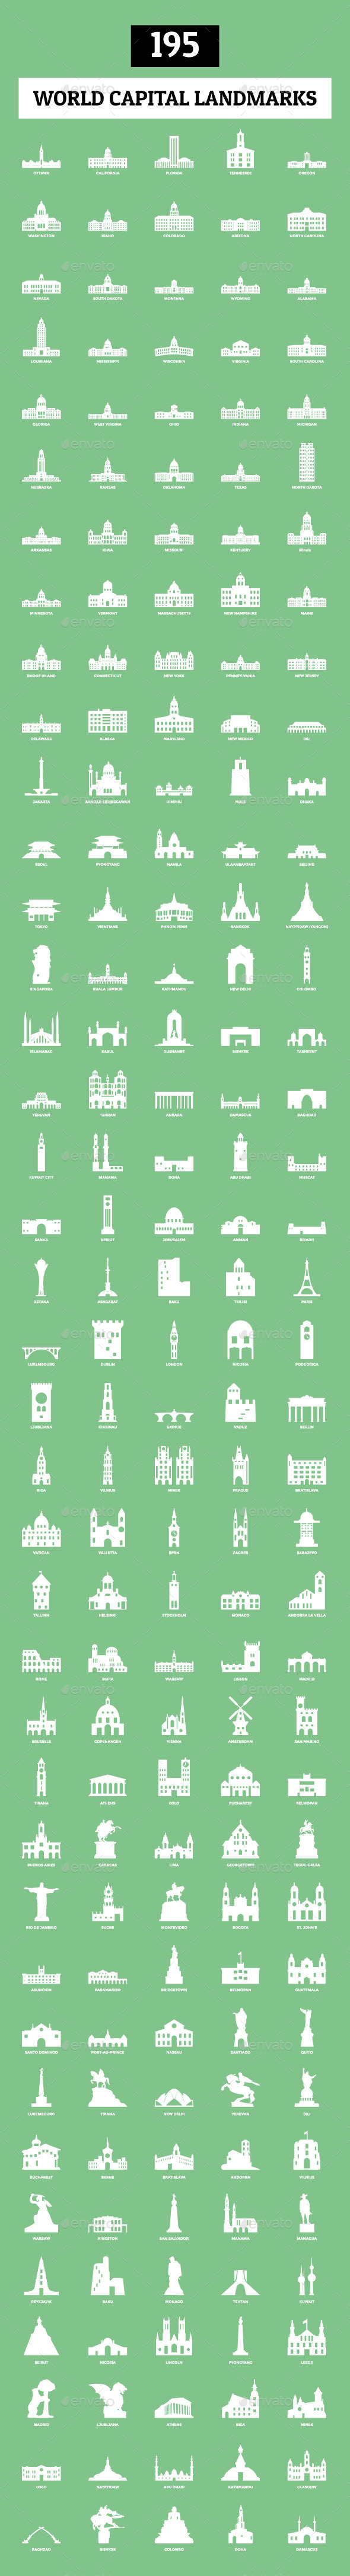 GraphicRiver 195 World Capital Landmarks 10702500